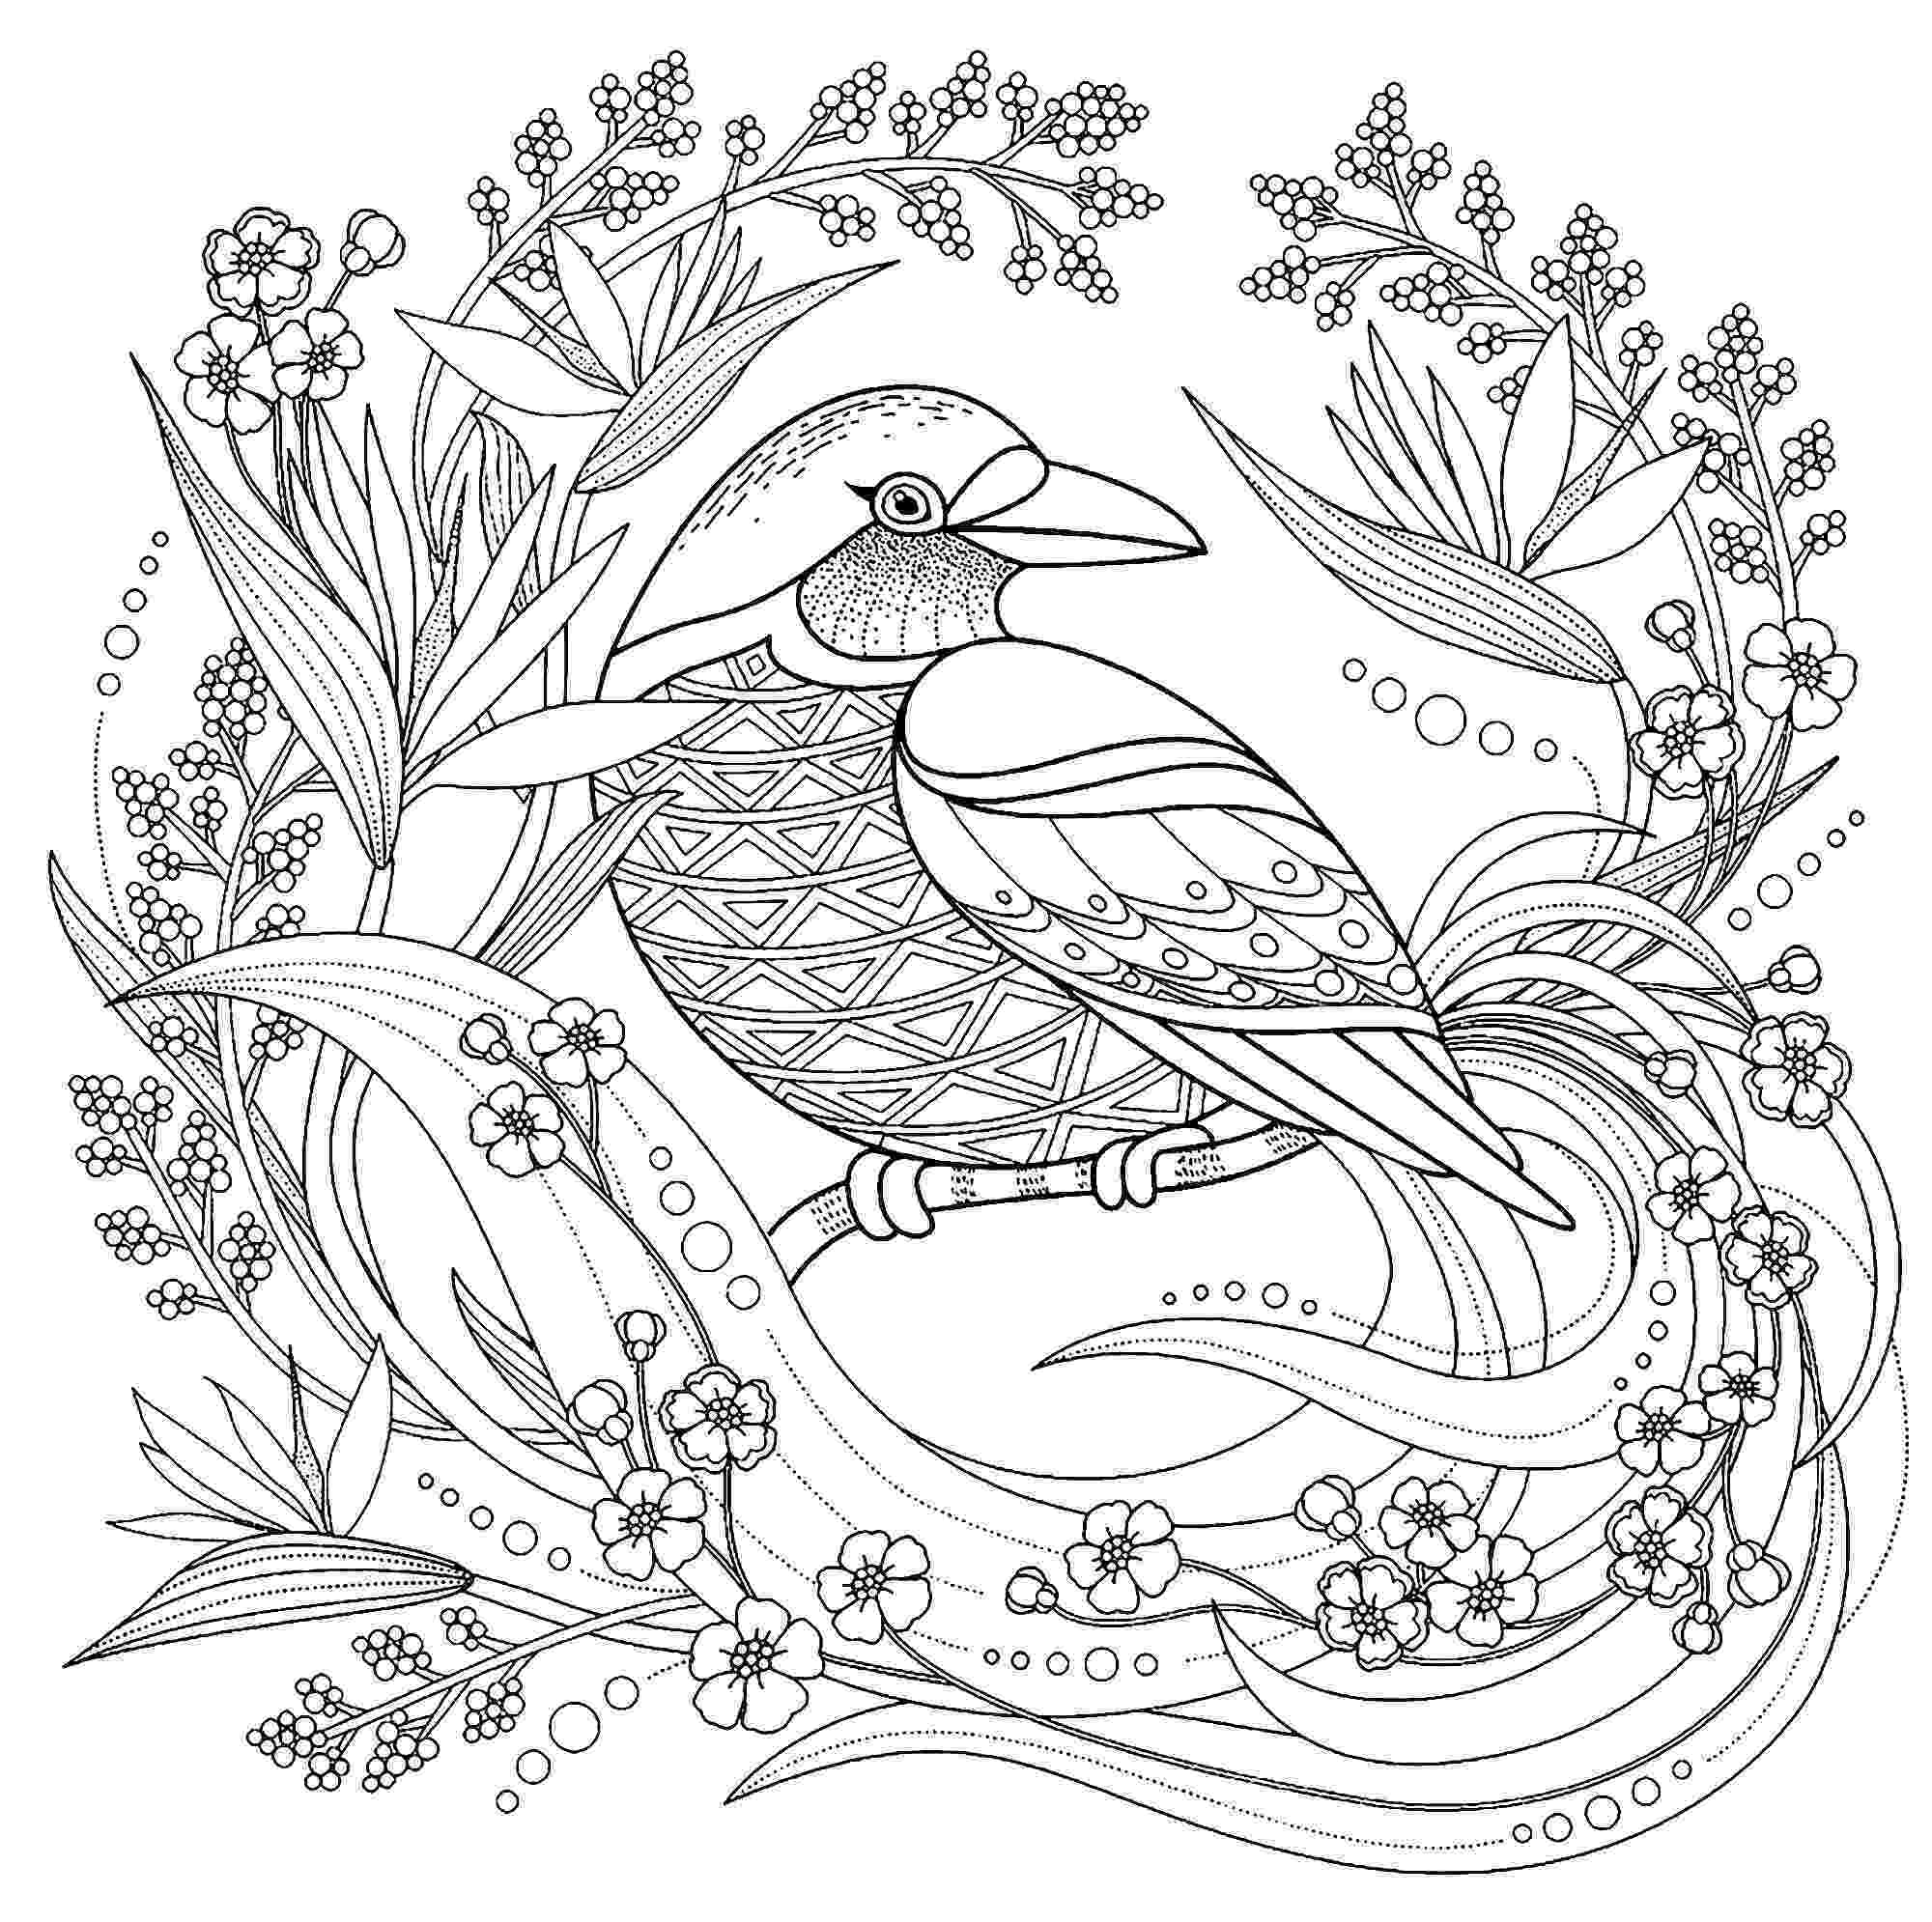 bird coloring pages free free printable tweety bird coloring pages for kids pages coloring bird free